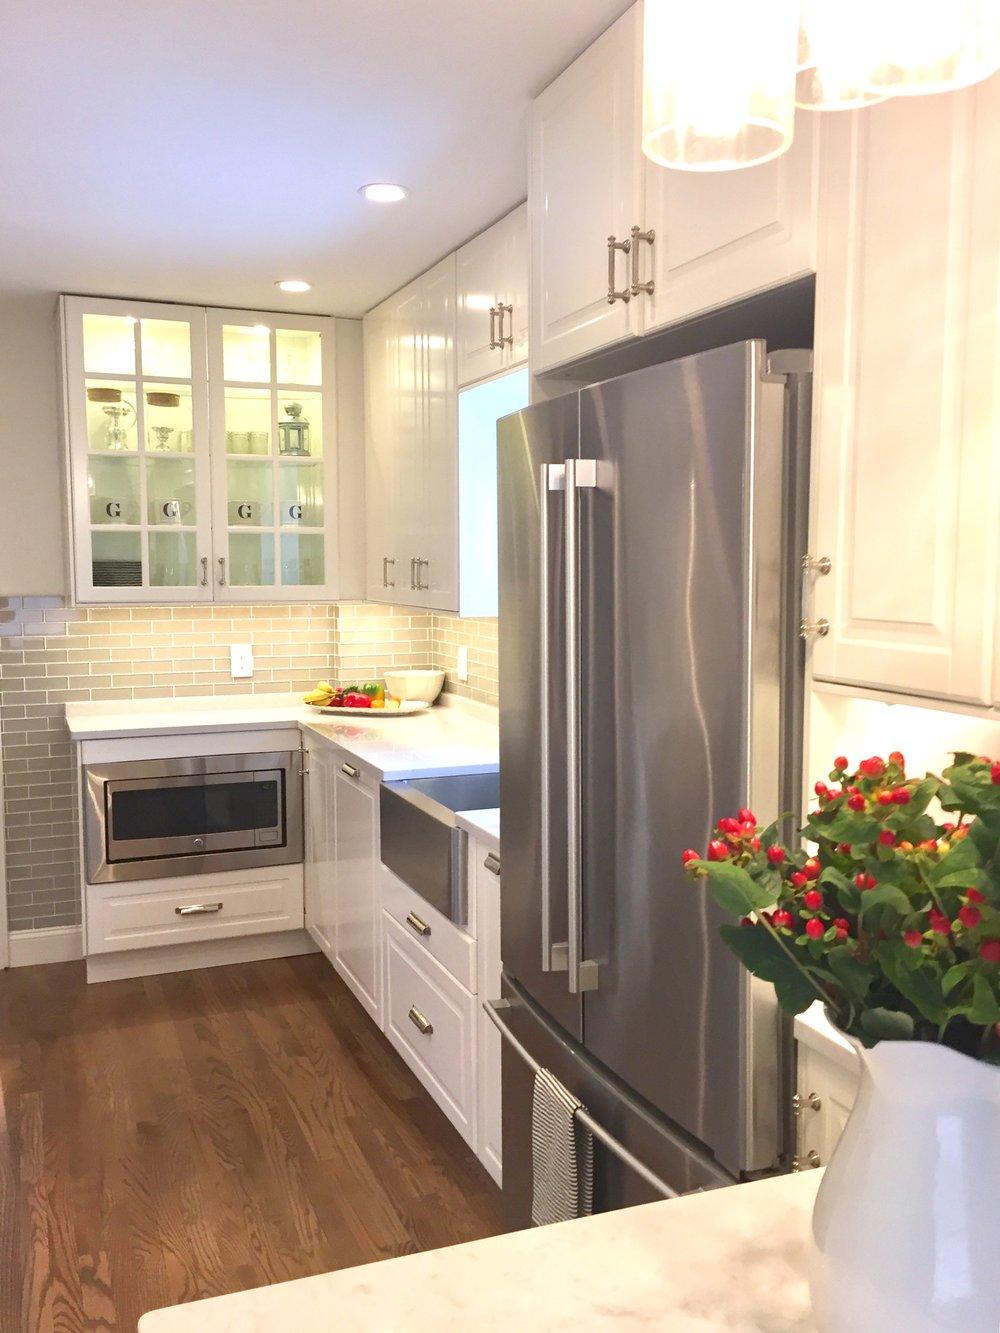 kitchenfridgeglass.jpg